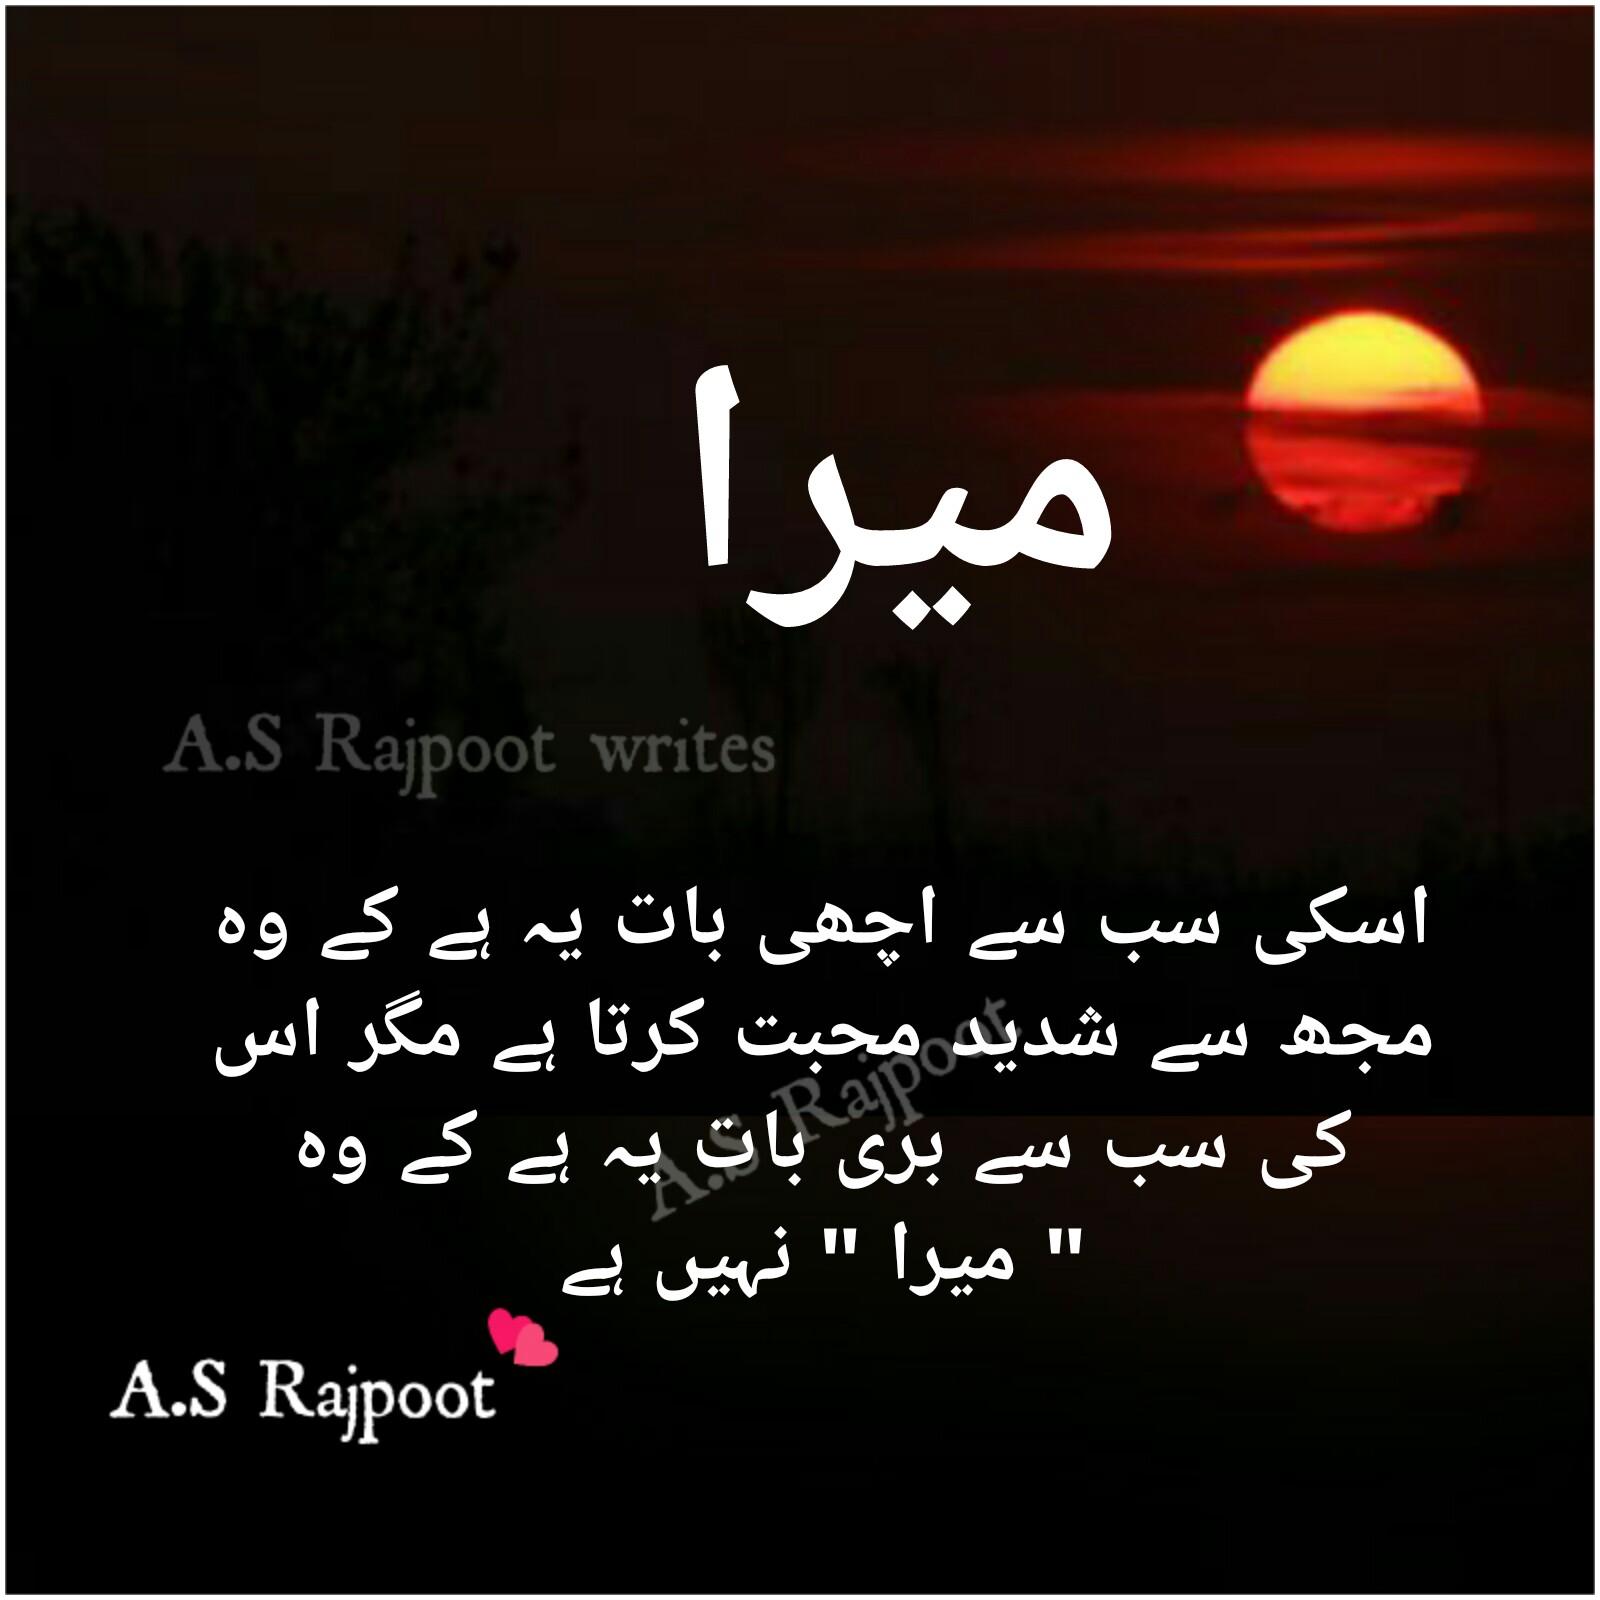 uski sab sy achi baat ye ha k woh || urdu post - A.S ...